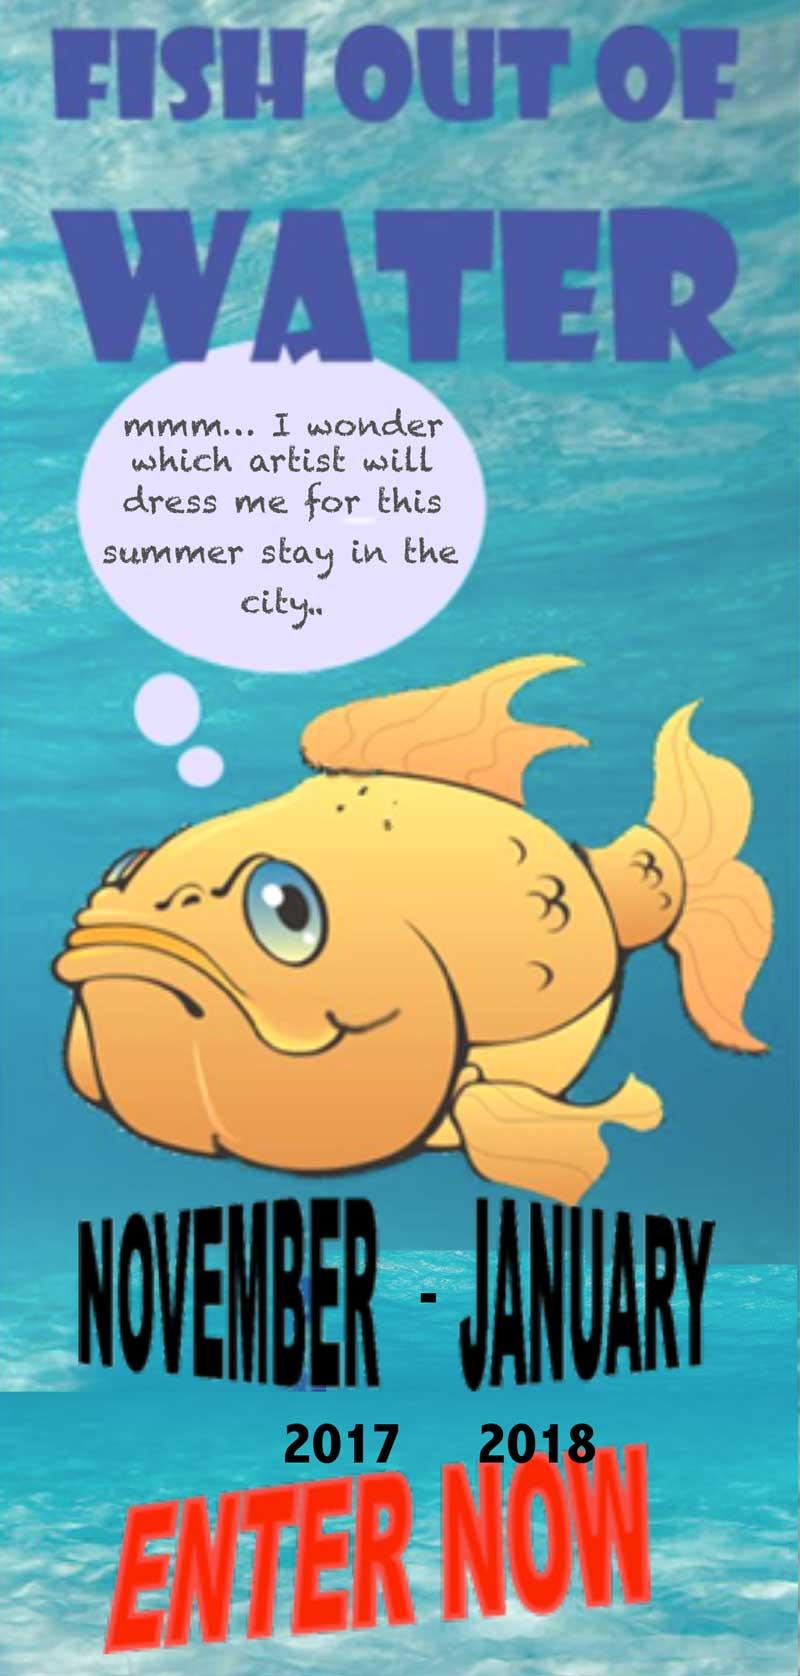 creative-rotorua-fish-out-of-water Home